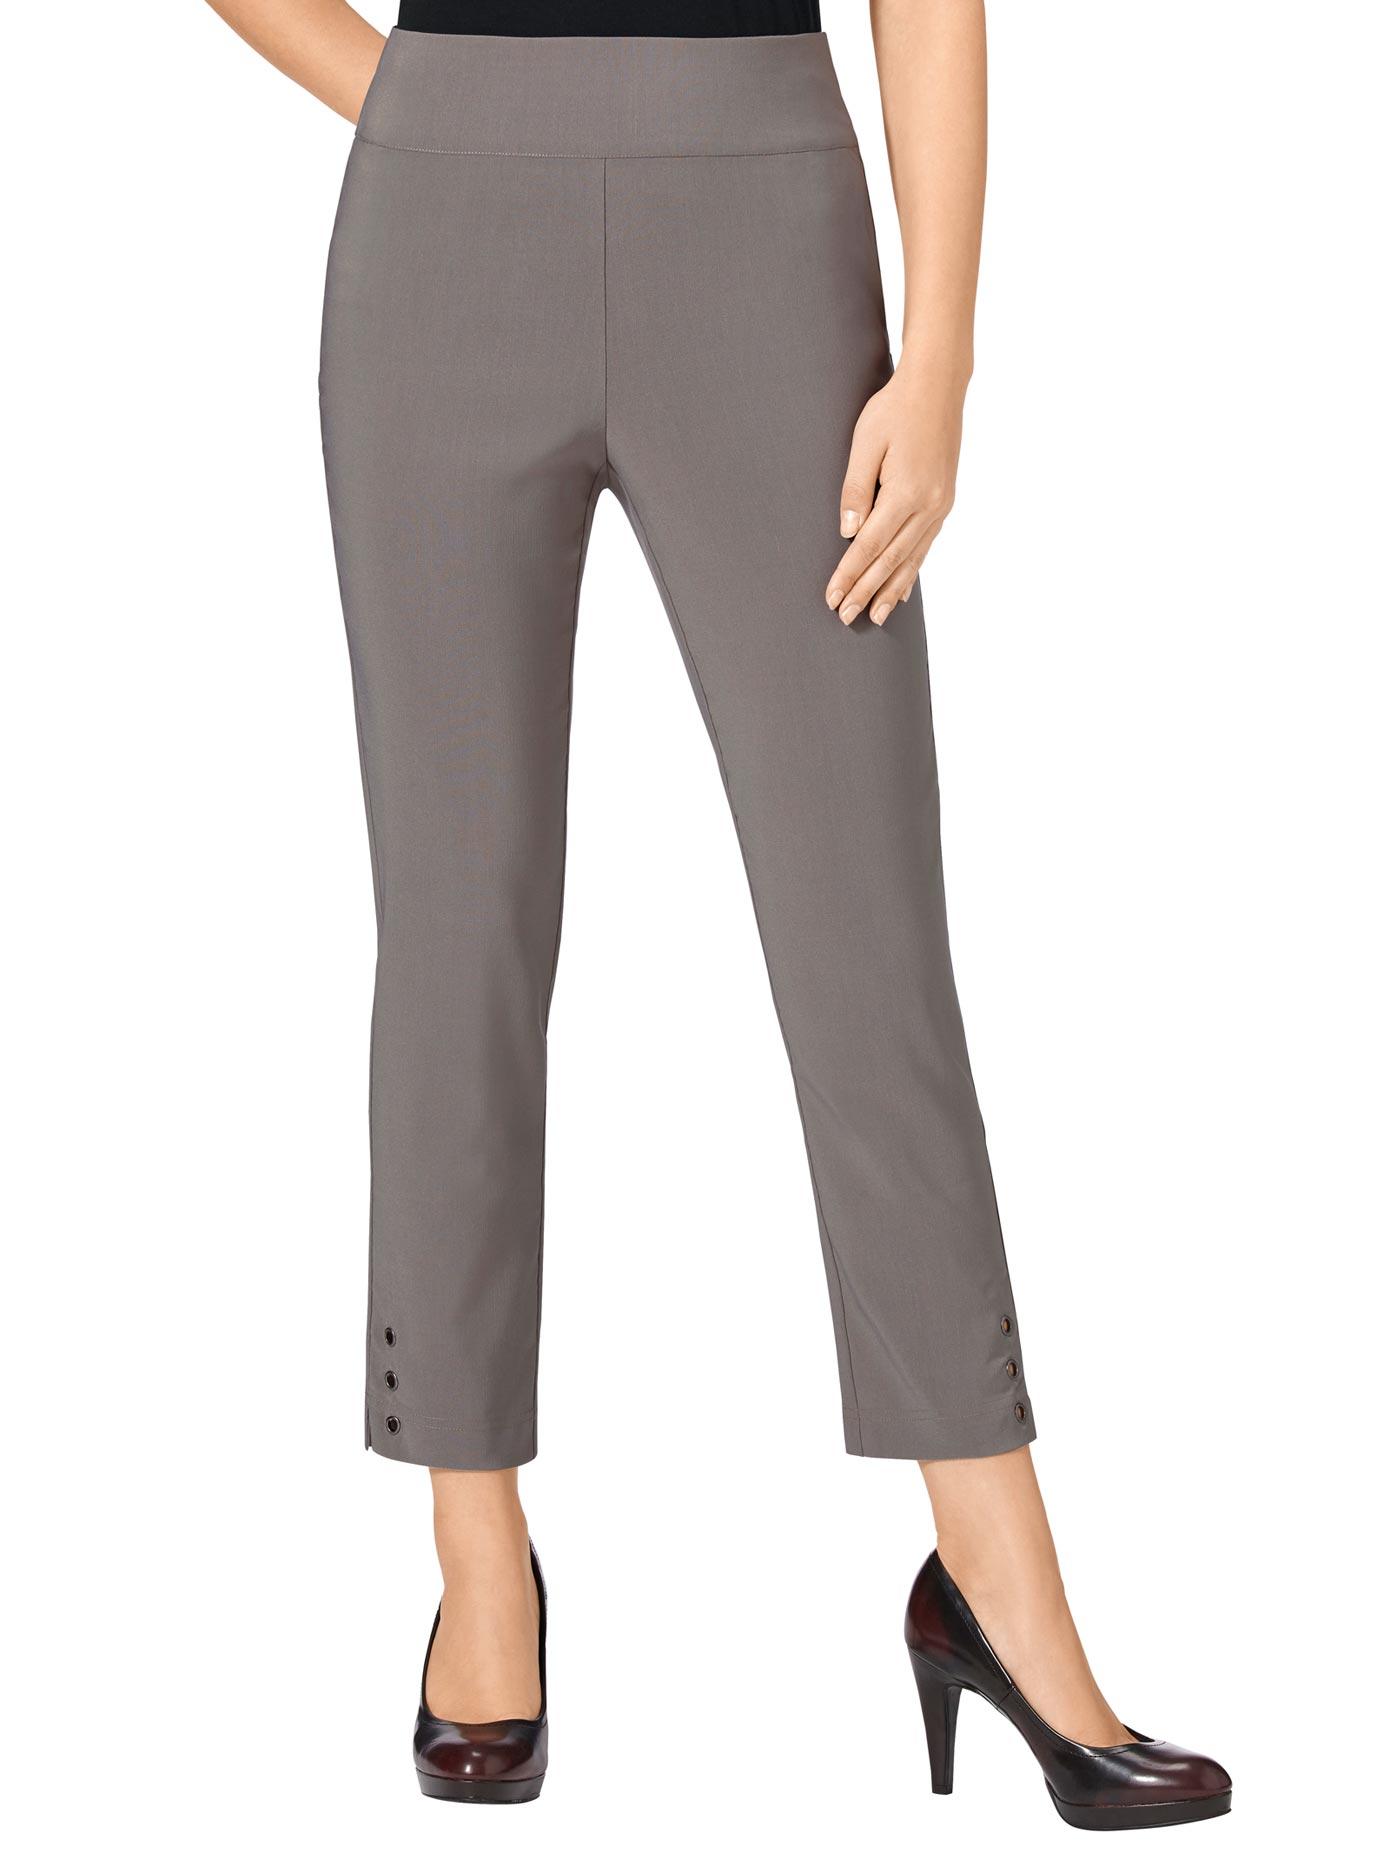 Lady 7/8-Hose in formstabiler Bengalin-Qualität | Bekleidung > Hosen > 7/8-Hosen | Lady